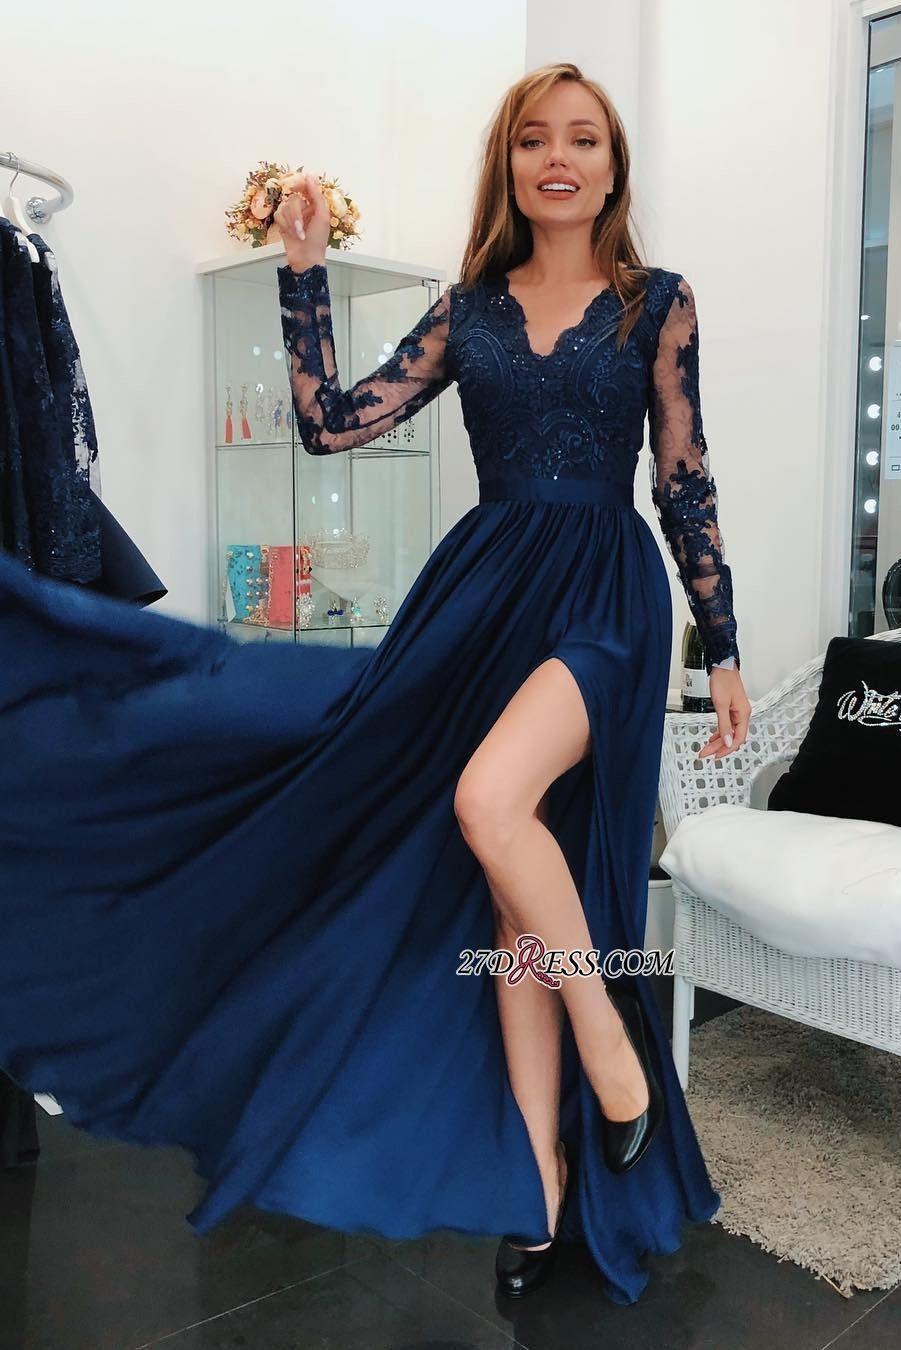 Modern Long Sleeve Lace Appliques Evening Dress Front Split Evening Dress High Quality Wedding Dresses P Prom Dresses Blue Prom Dresses Long Banquet Dresses [ 1350 x 901 Pixel ]